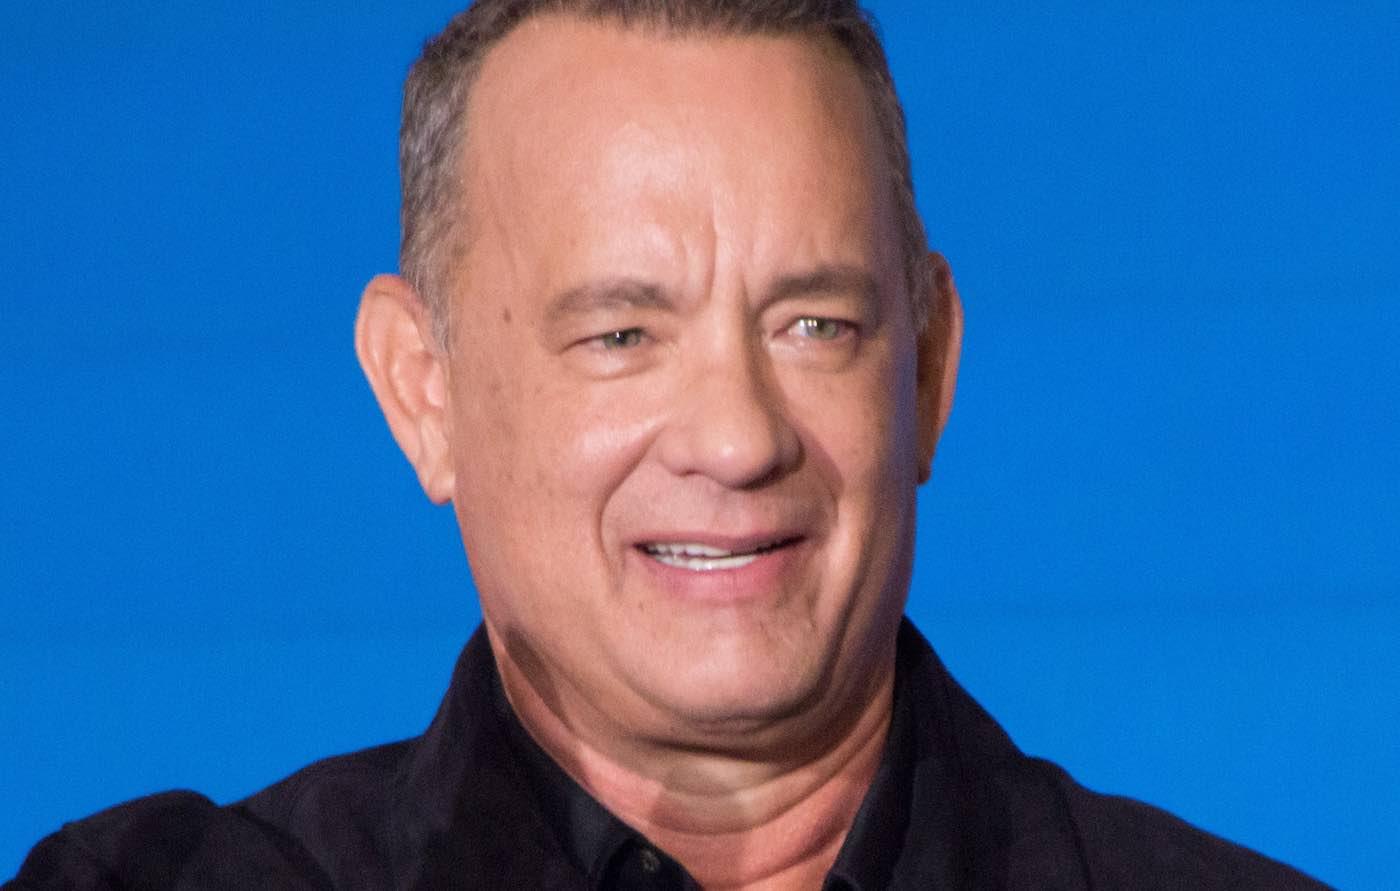 Tom Hanks Donates His Blood Plasma Following Coronavirus Diagnosis